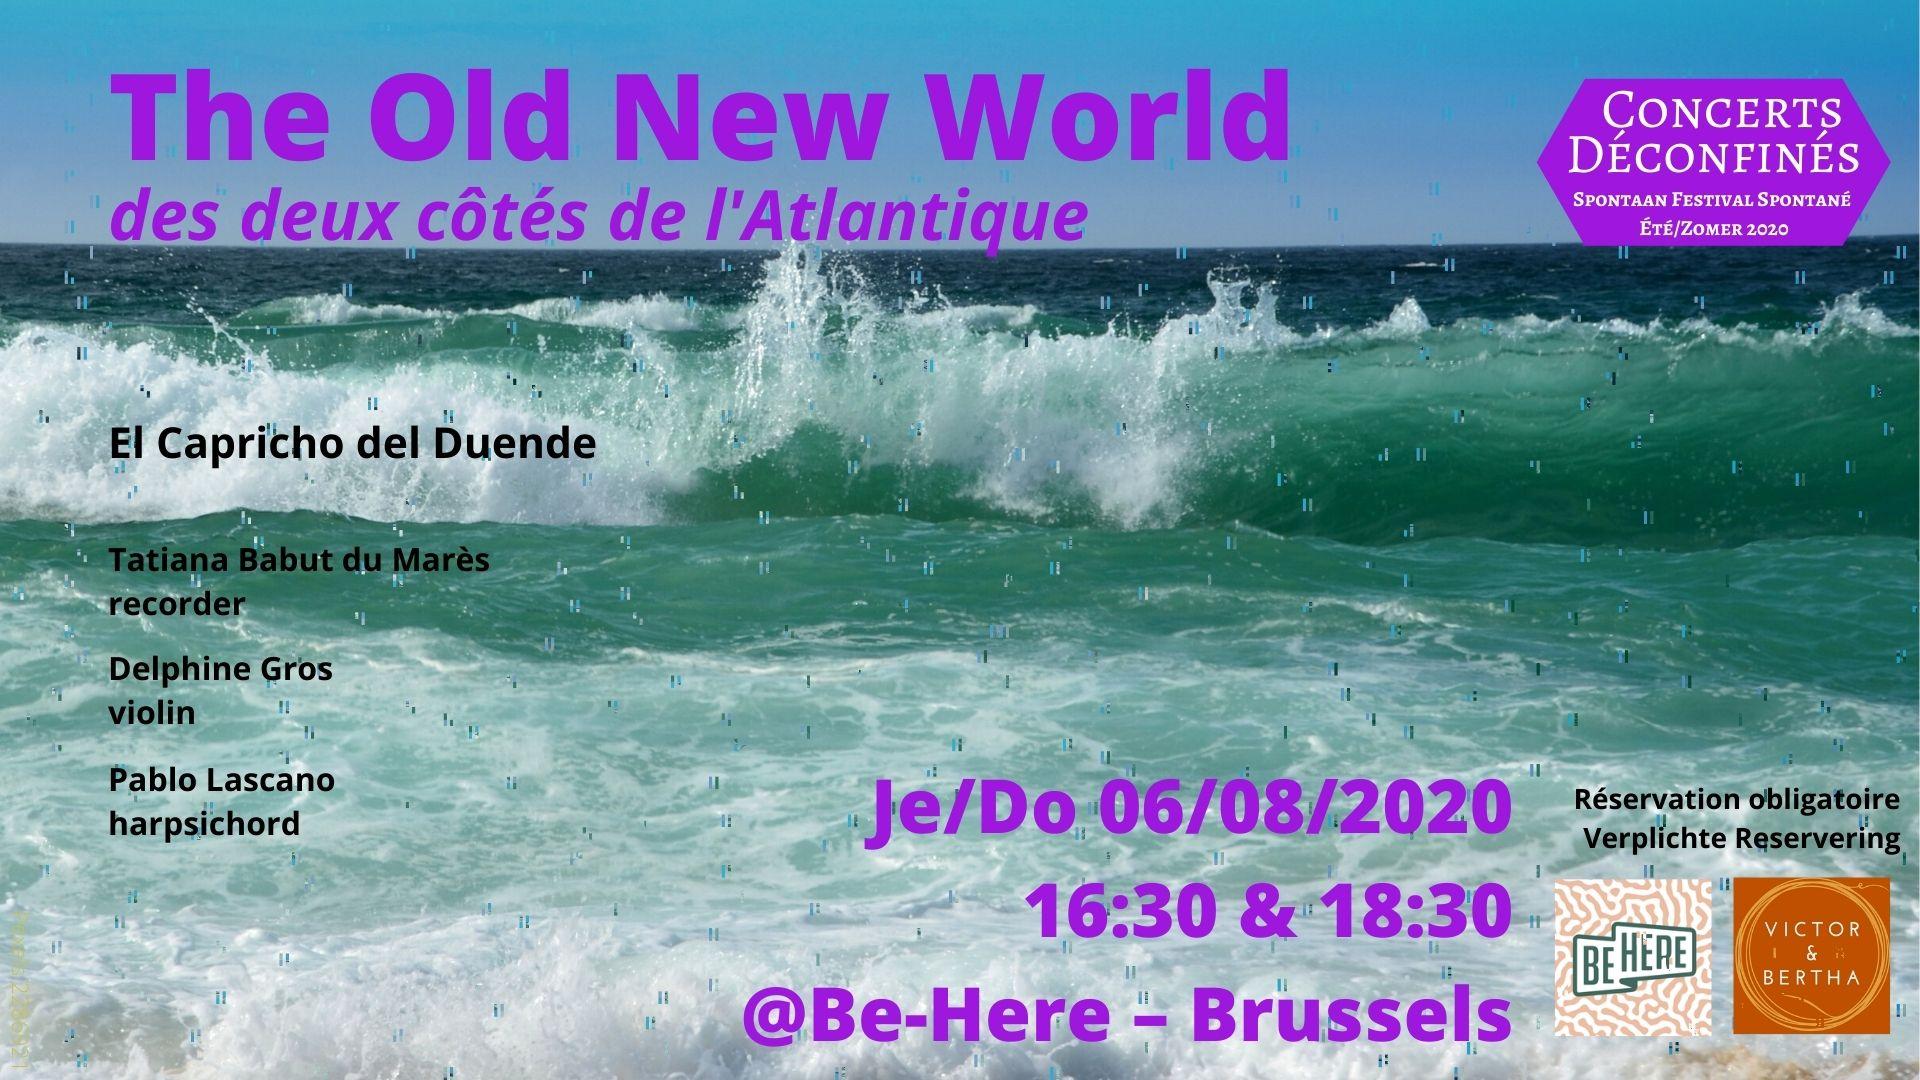 The Old New World - El Capricho del Duende